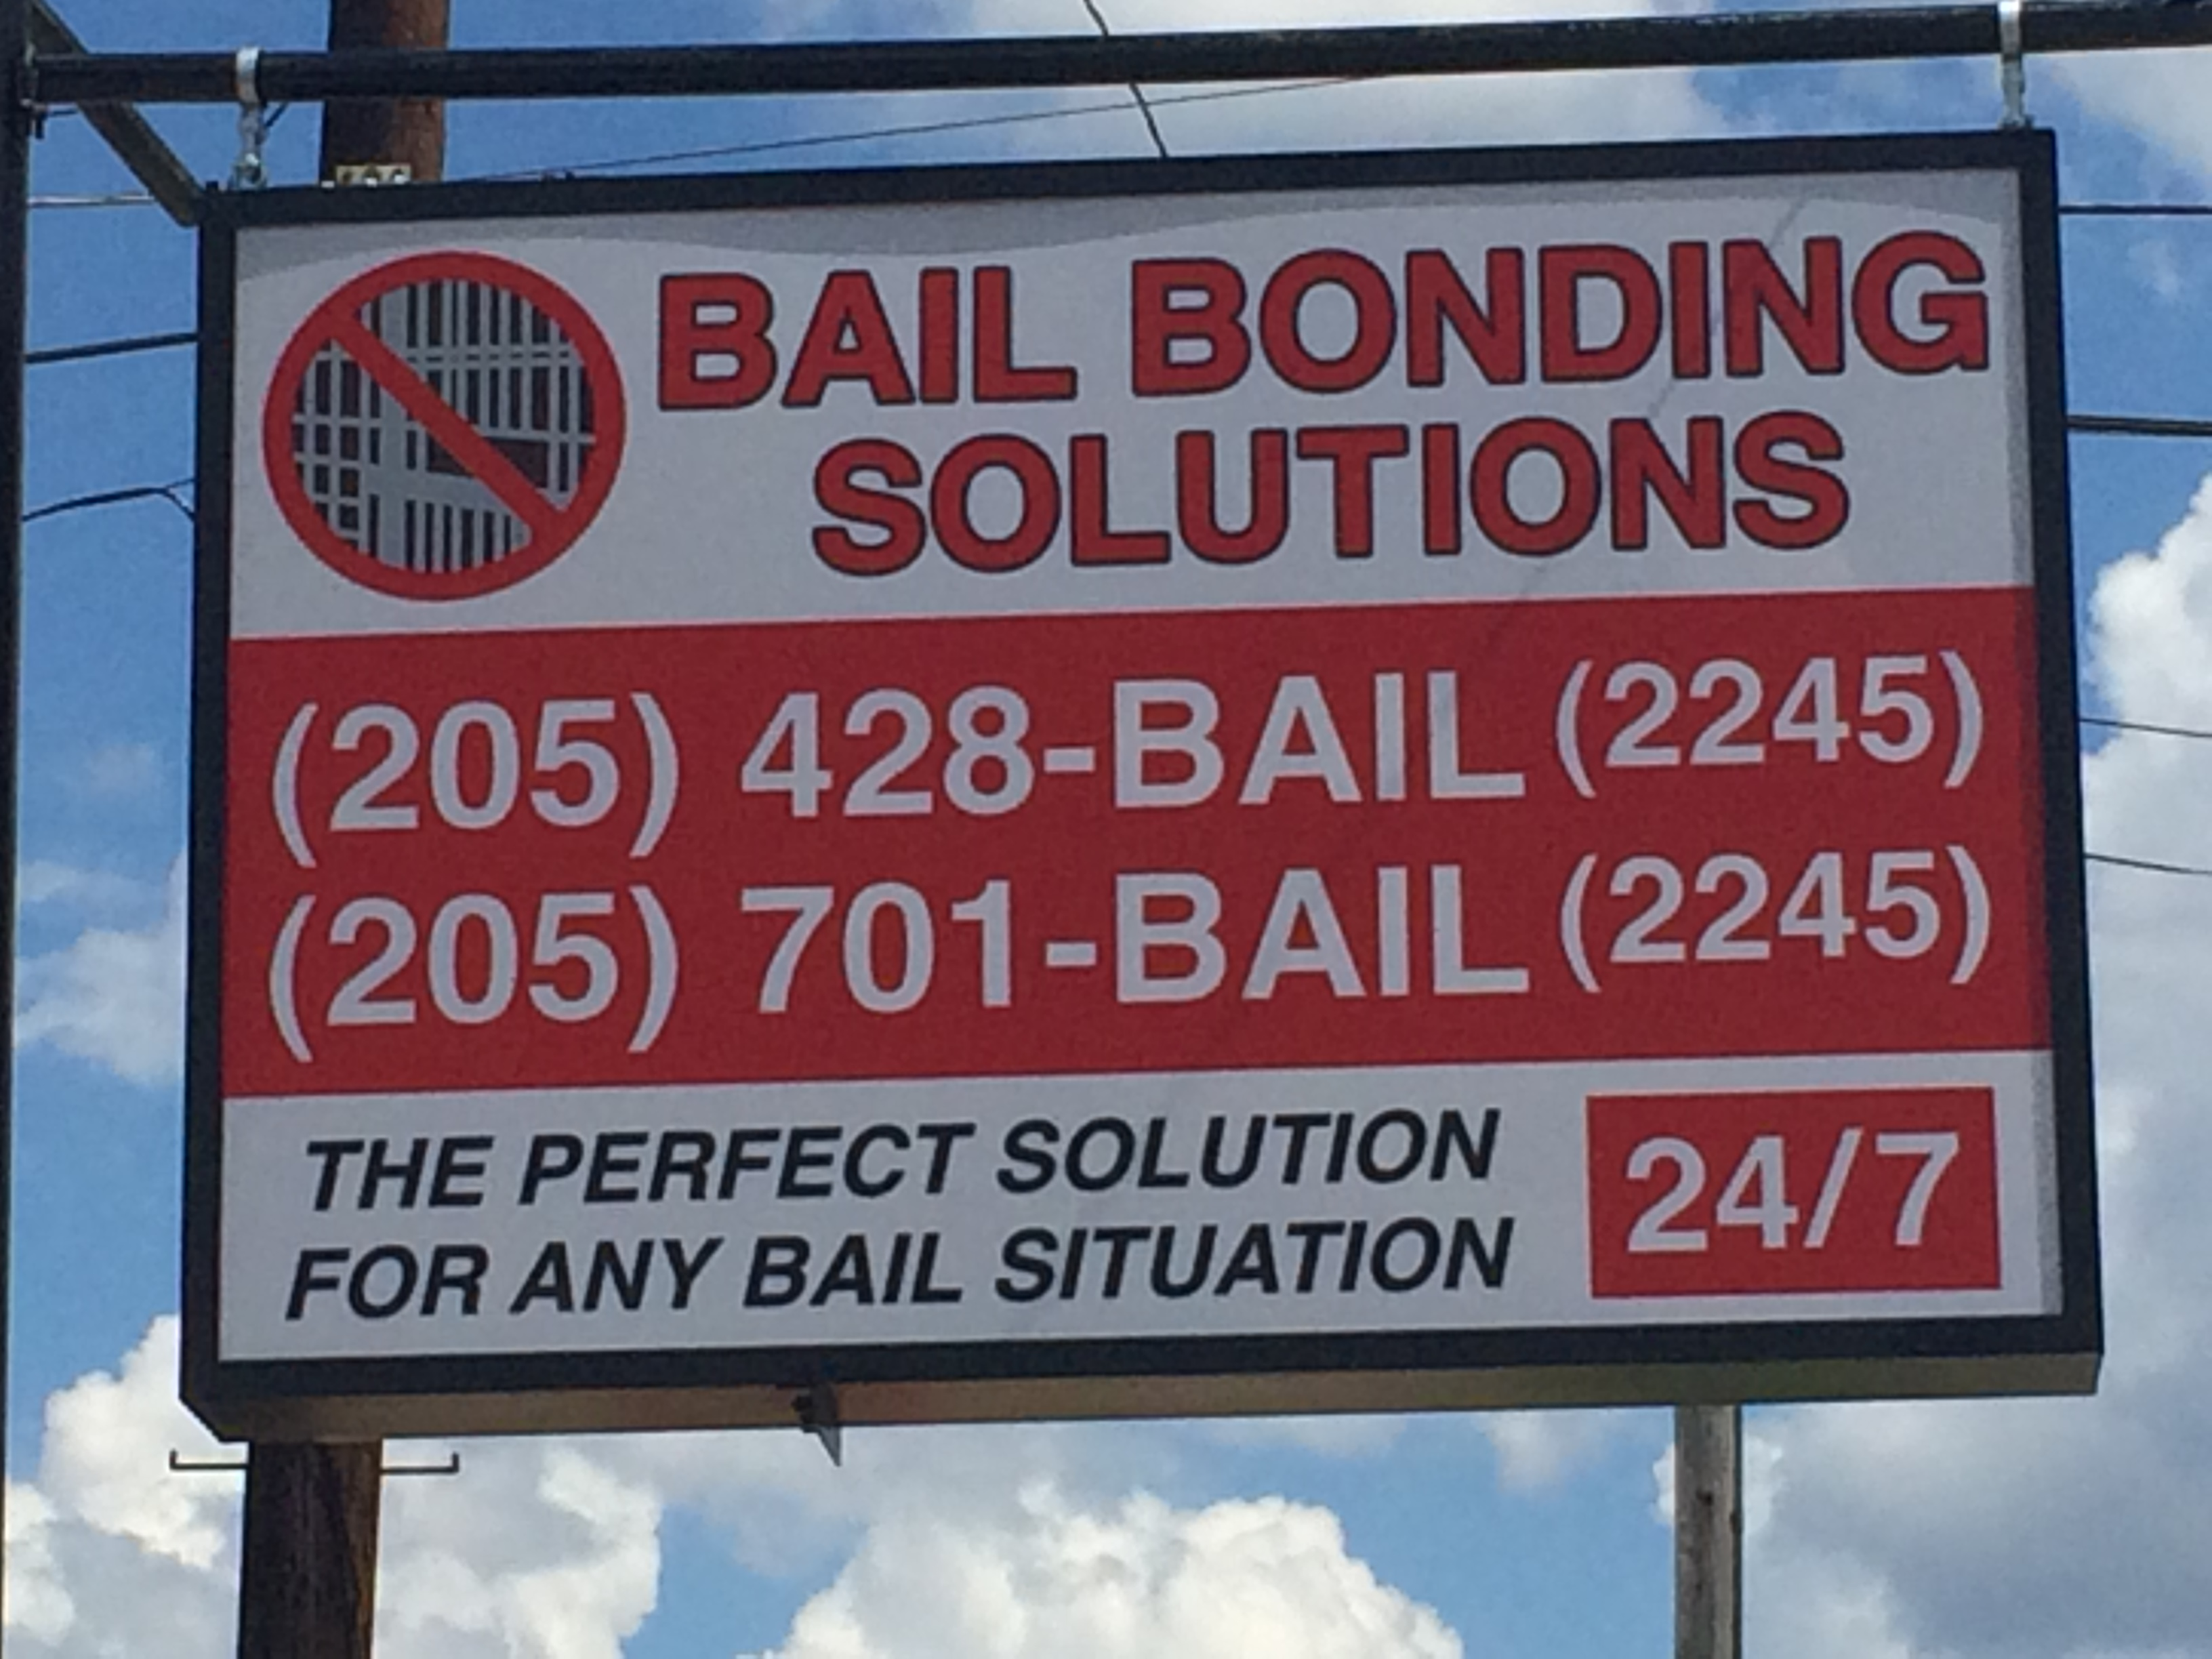 Bail Bonding Solutions, LLC